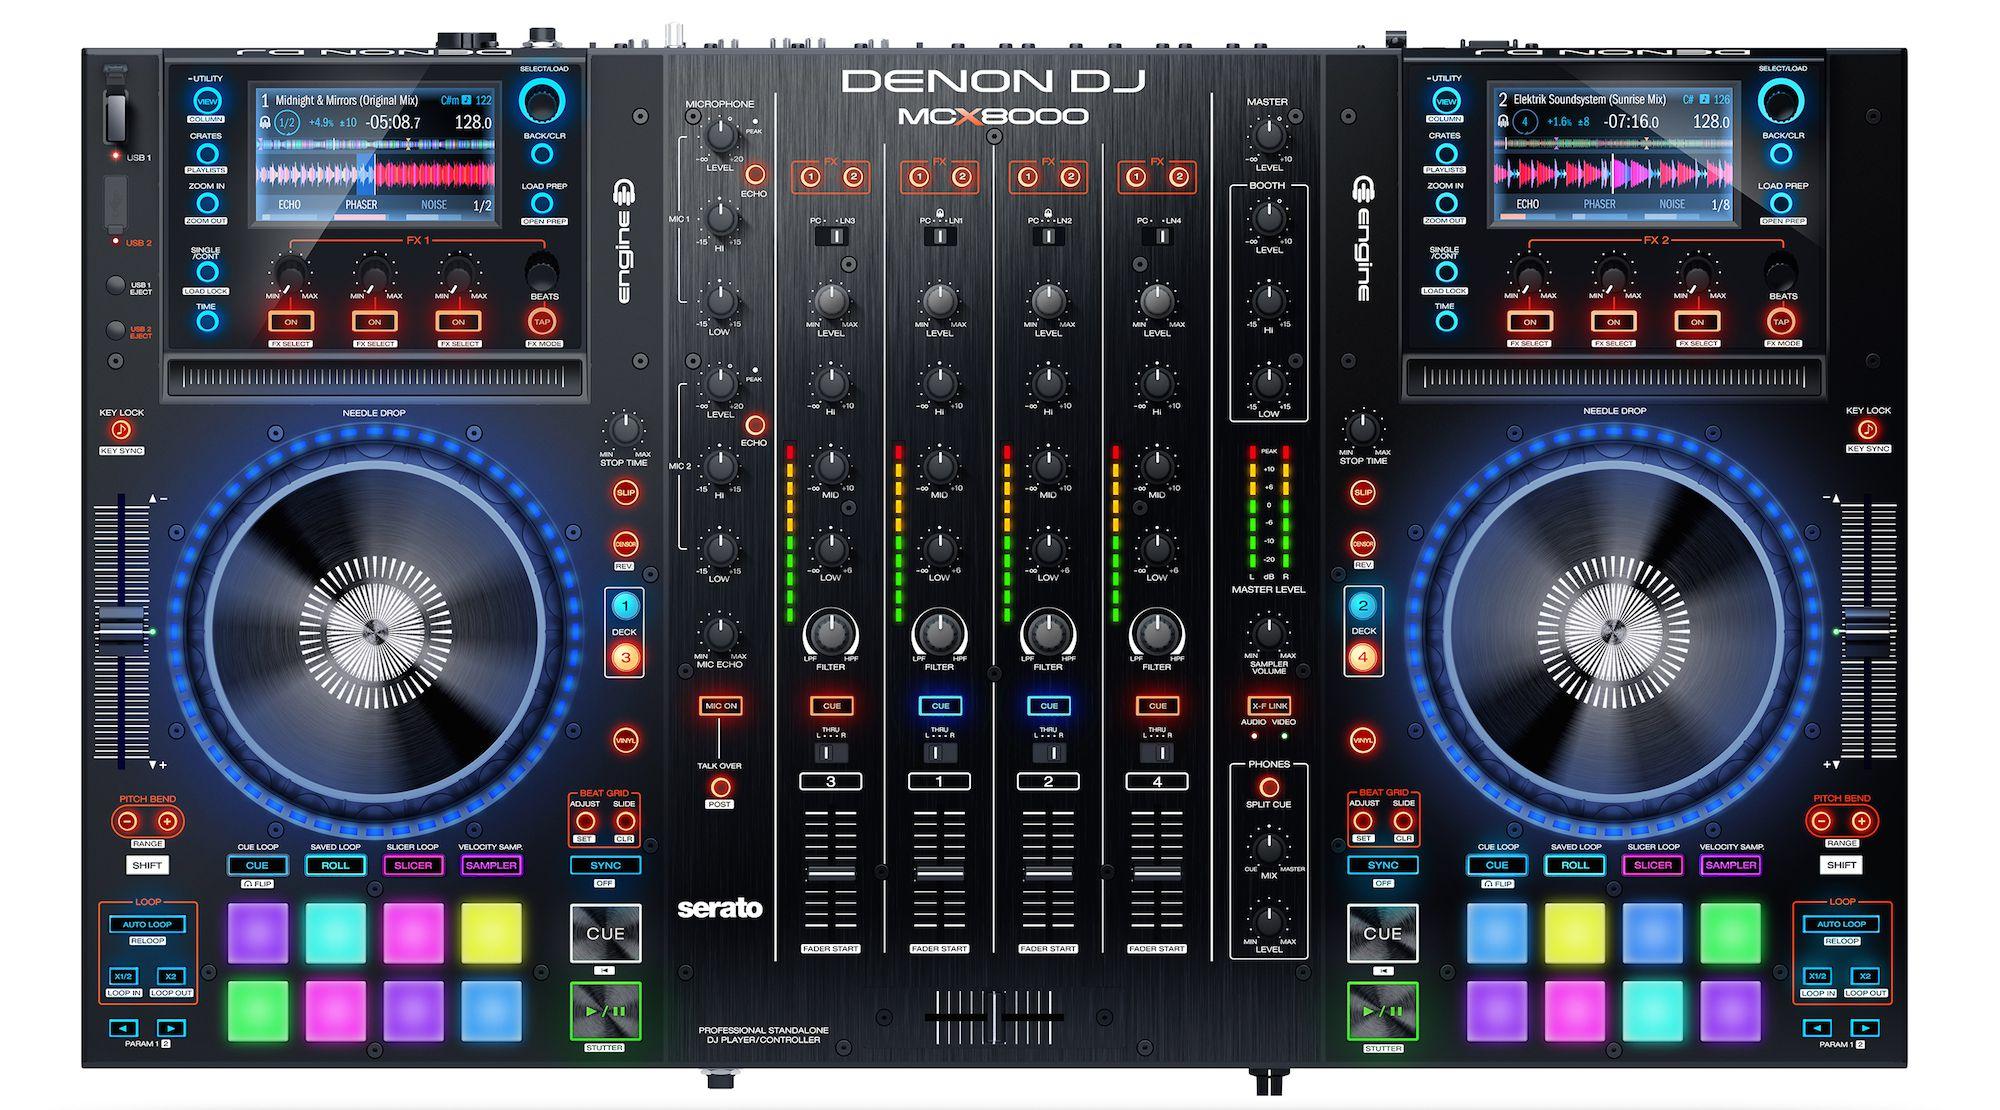 Denon DJ MCX8000 Top